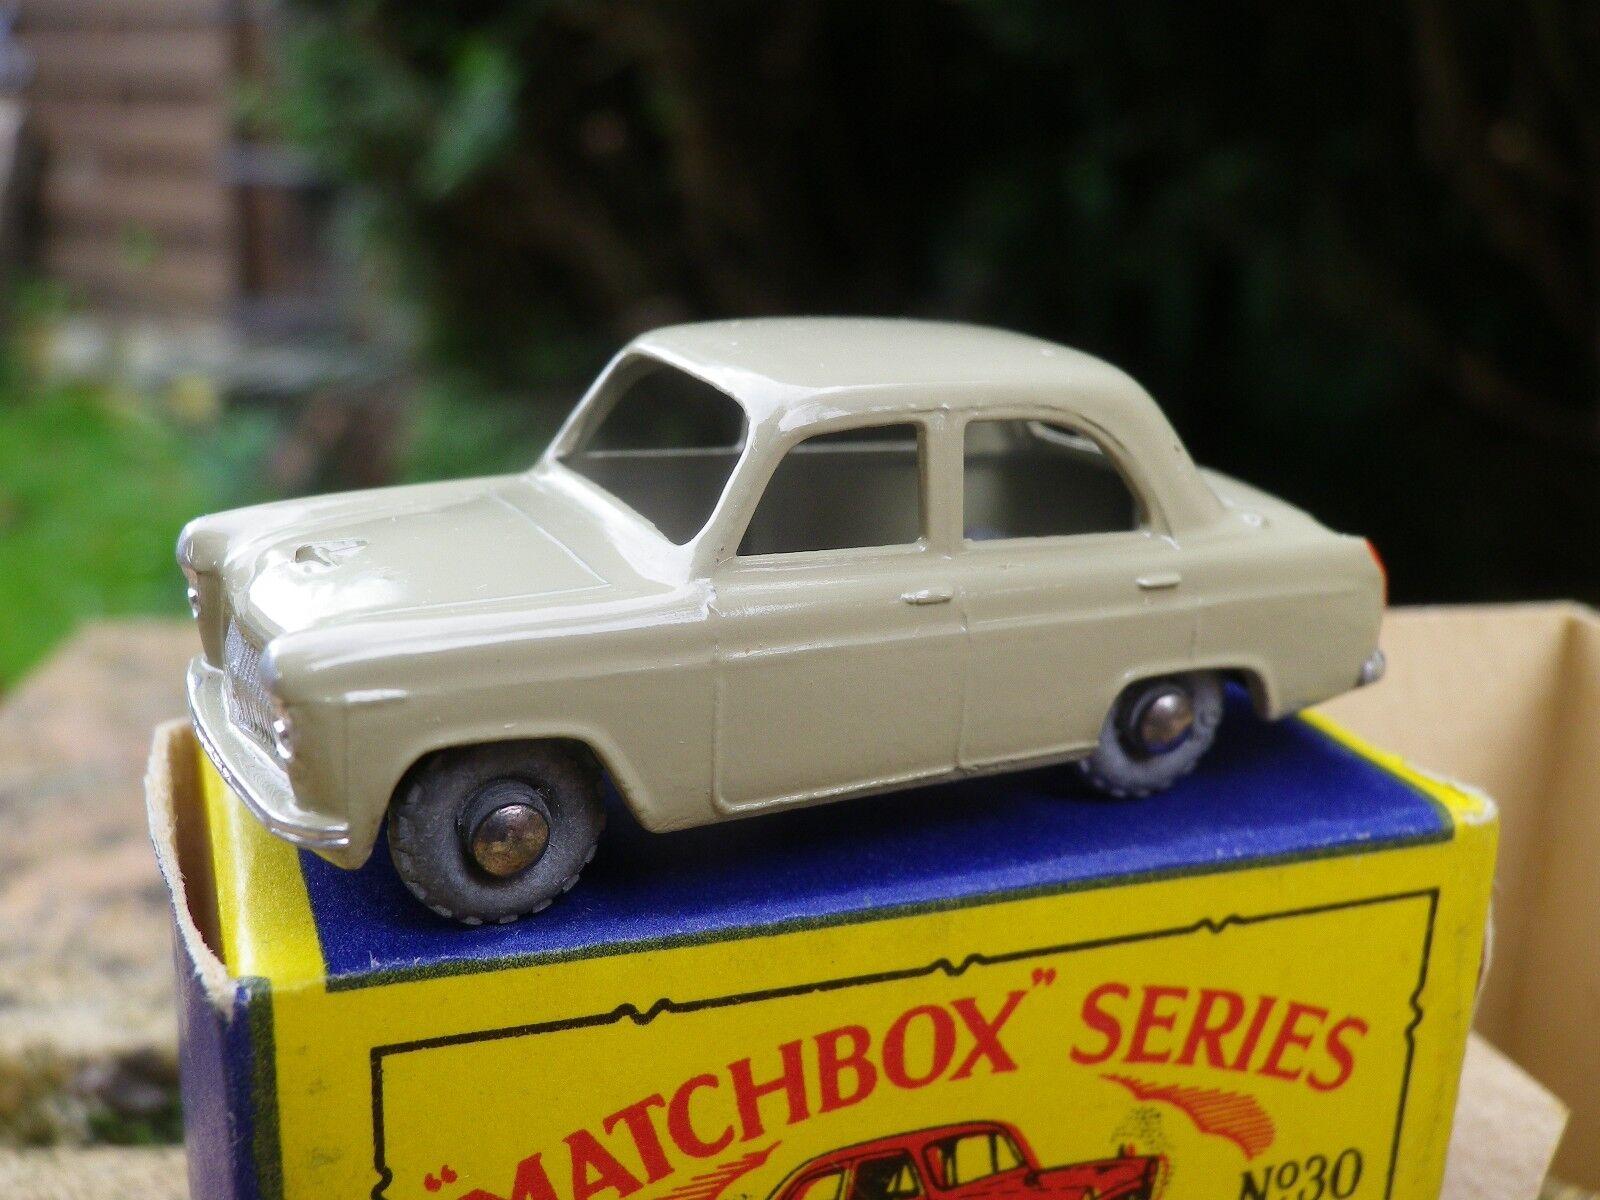 Matchbox lesney moko 30 ford prefect as new, superb b2 box see photos